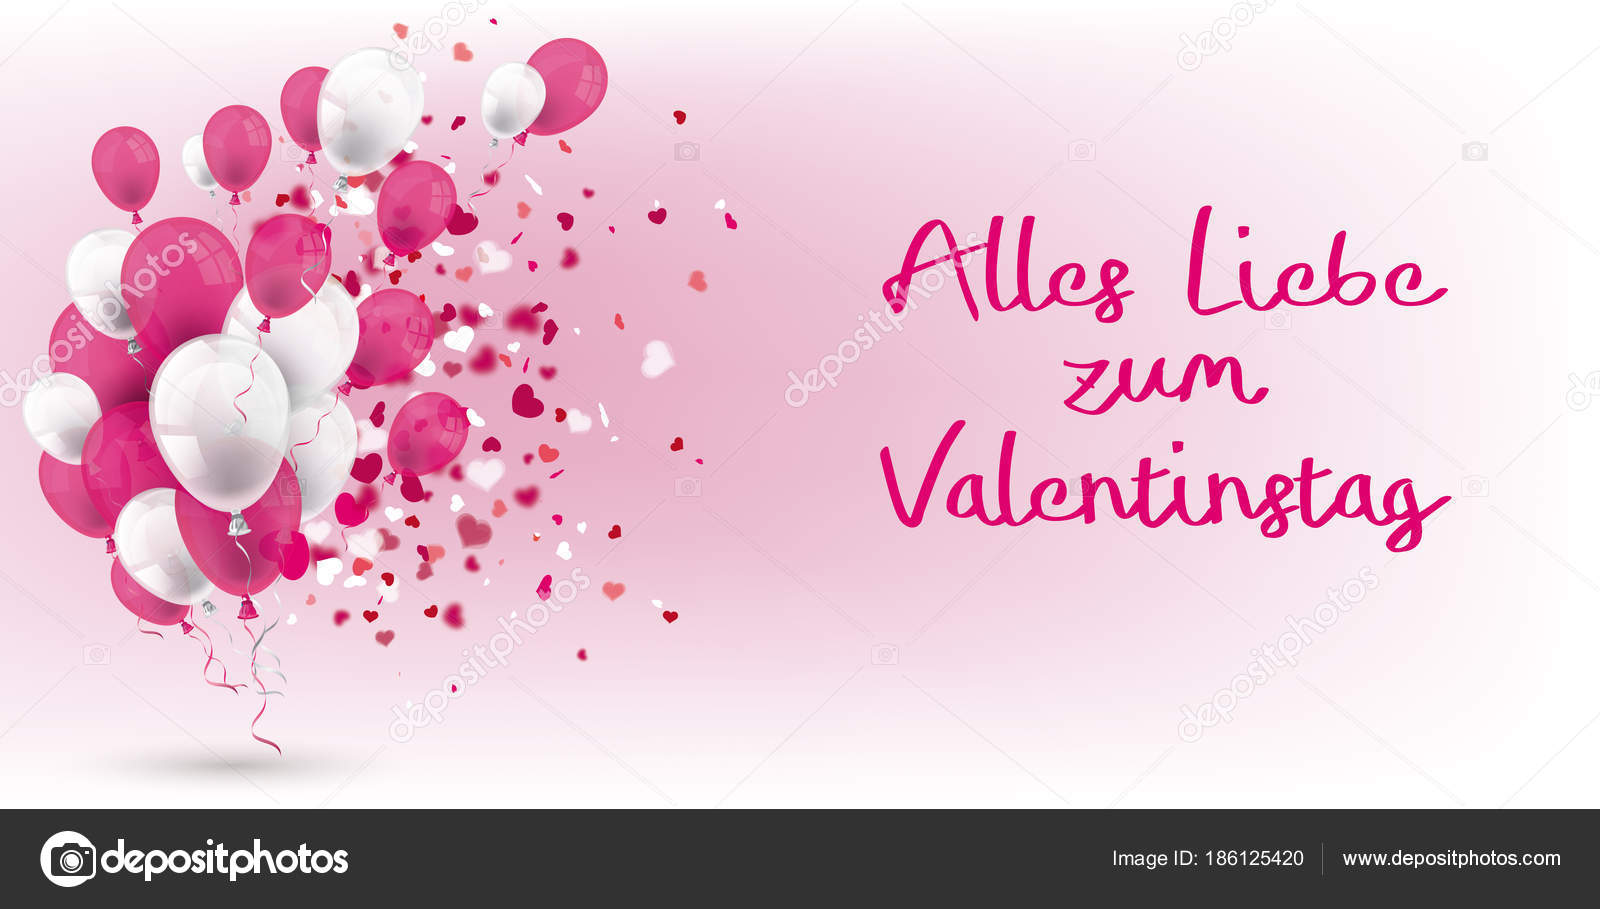 Kolorowe Balony Serca Tekst Niemiecki Alles Liebe Zum Valentinstag